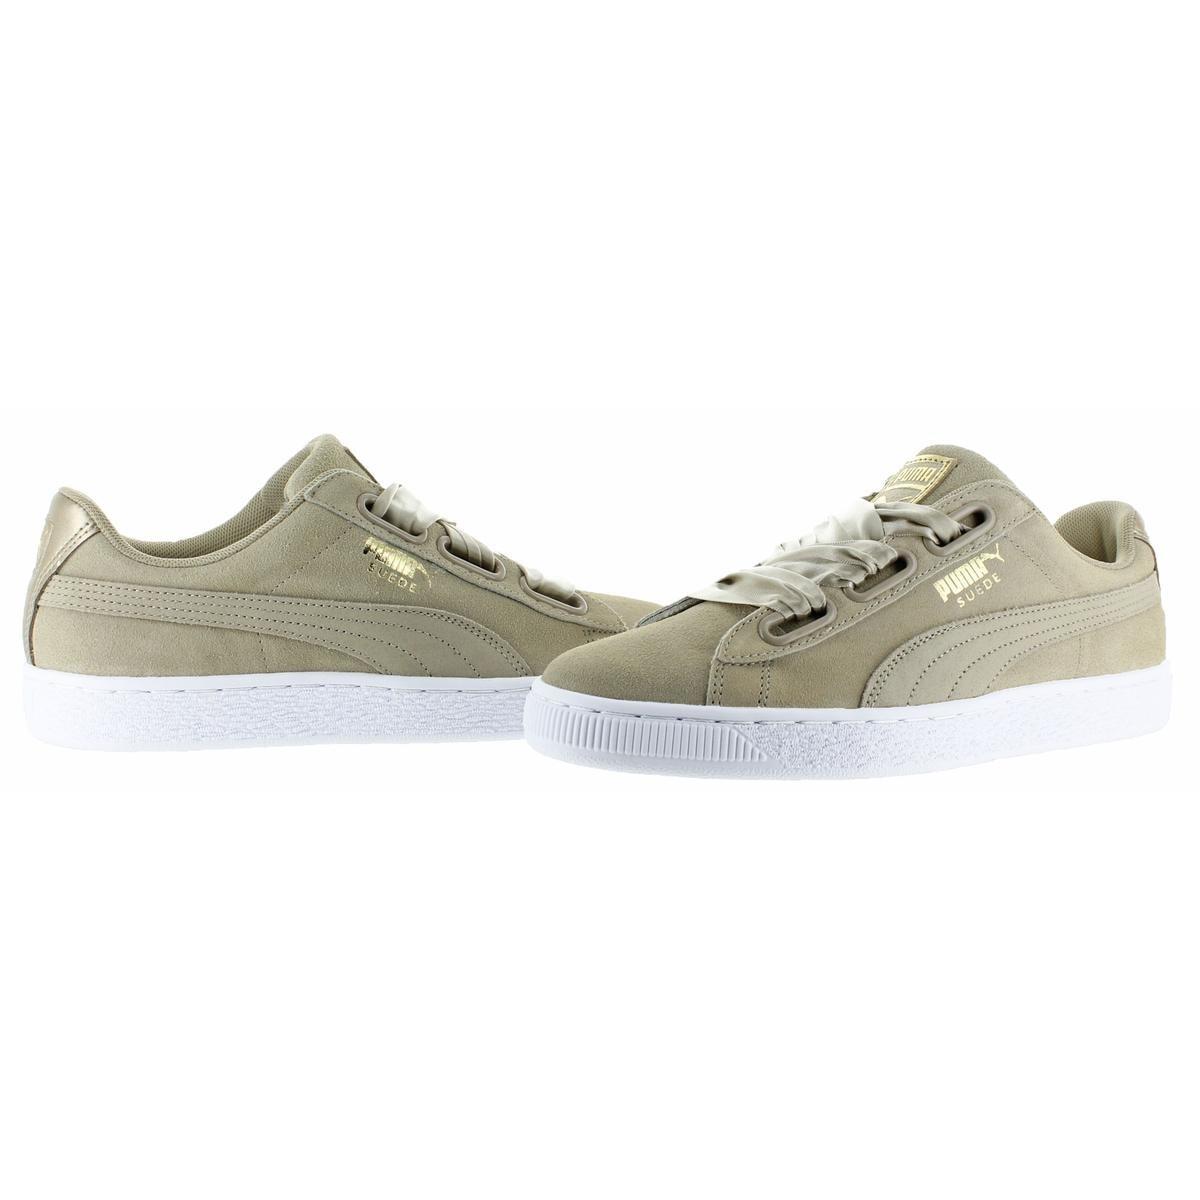 775ac3db328df8 Shop Puma Womens Suede Heart Safari Fashion Sneakers Low Top Casual ...